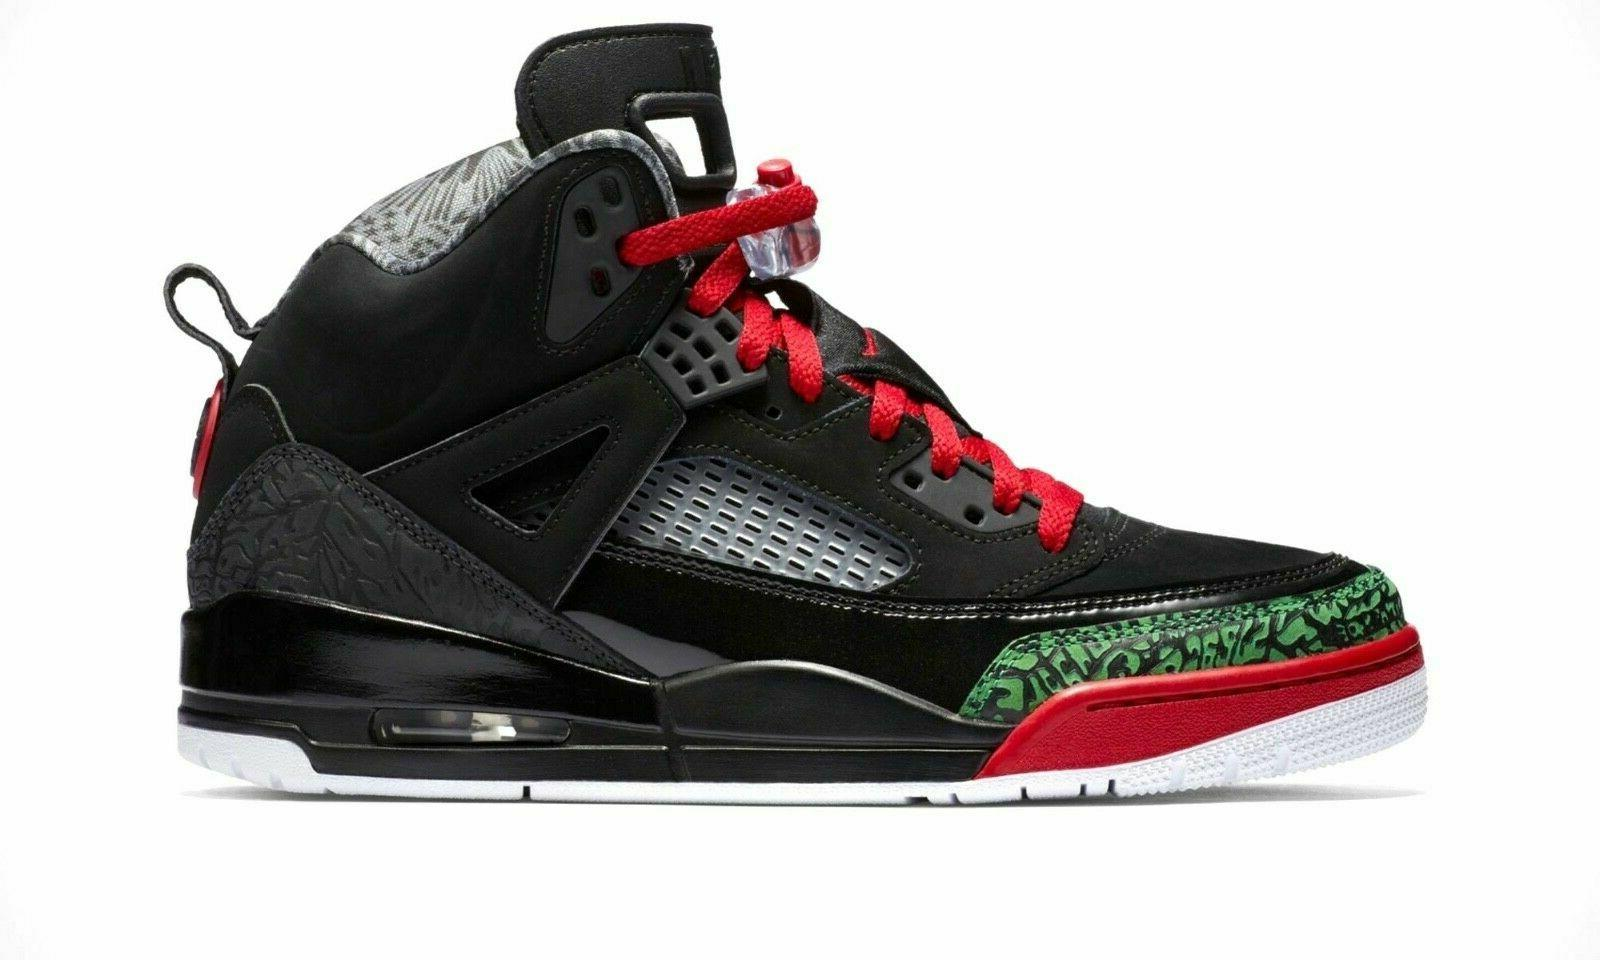 Nike Air Basketball Shoes Green 315371-026 Men's